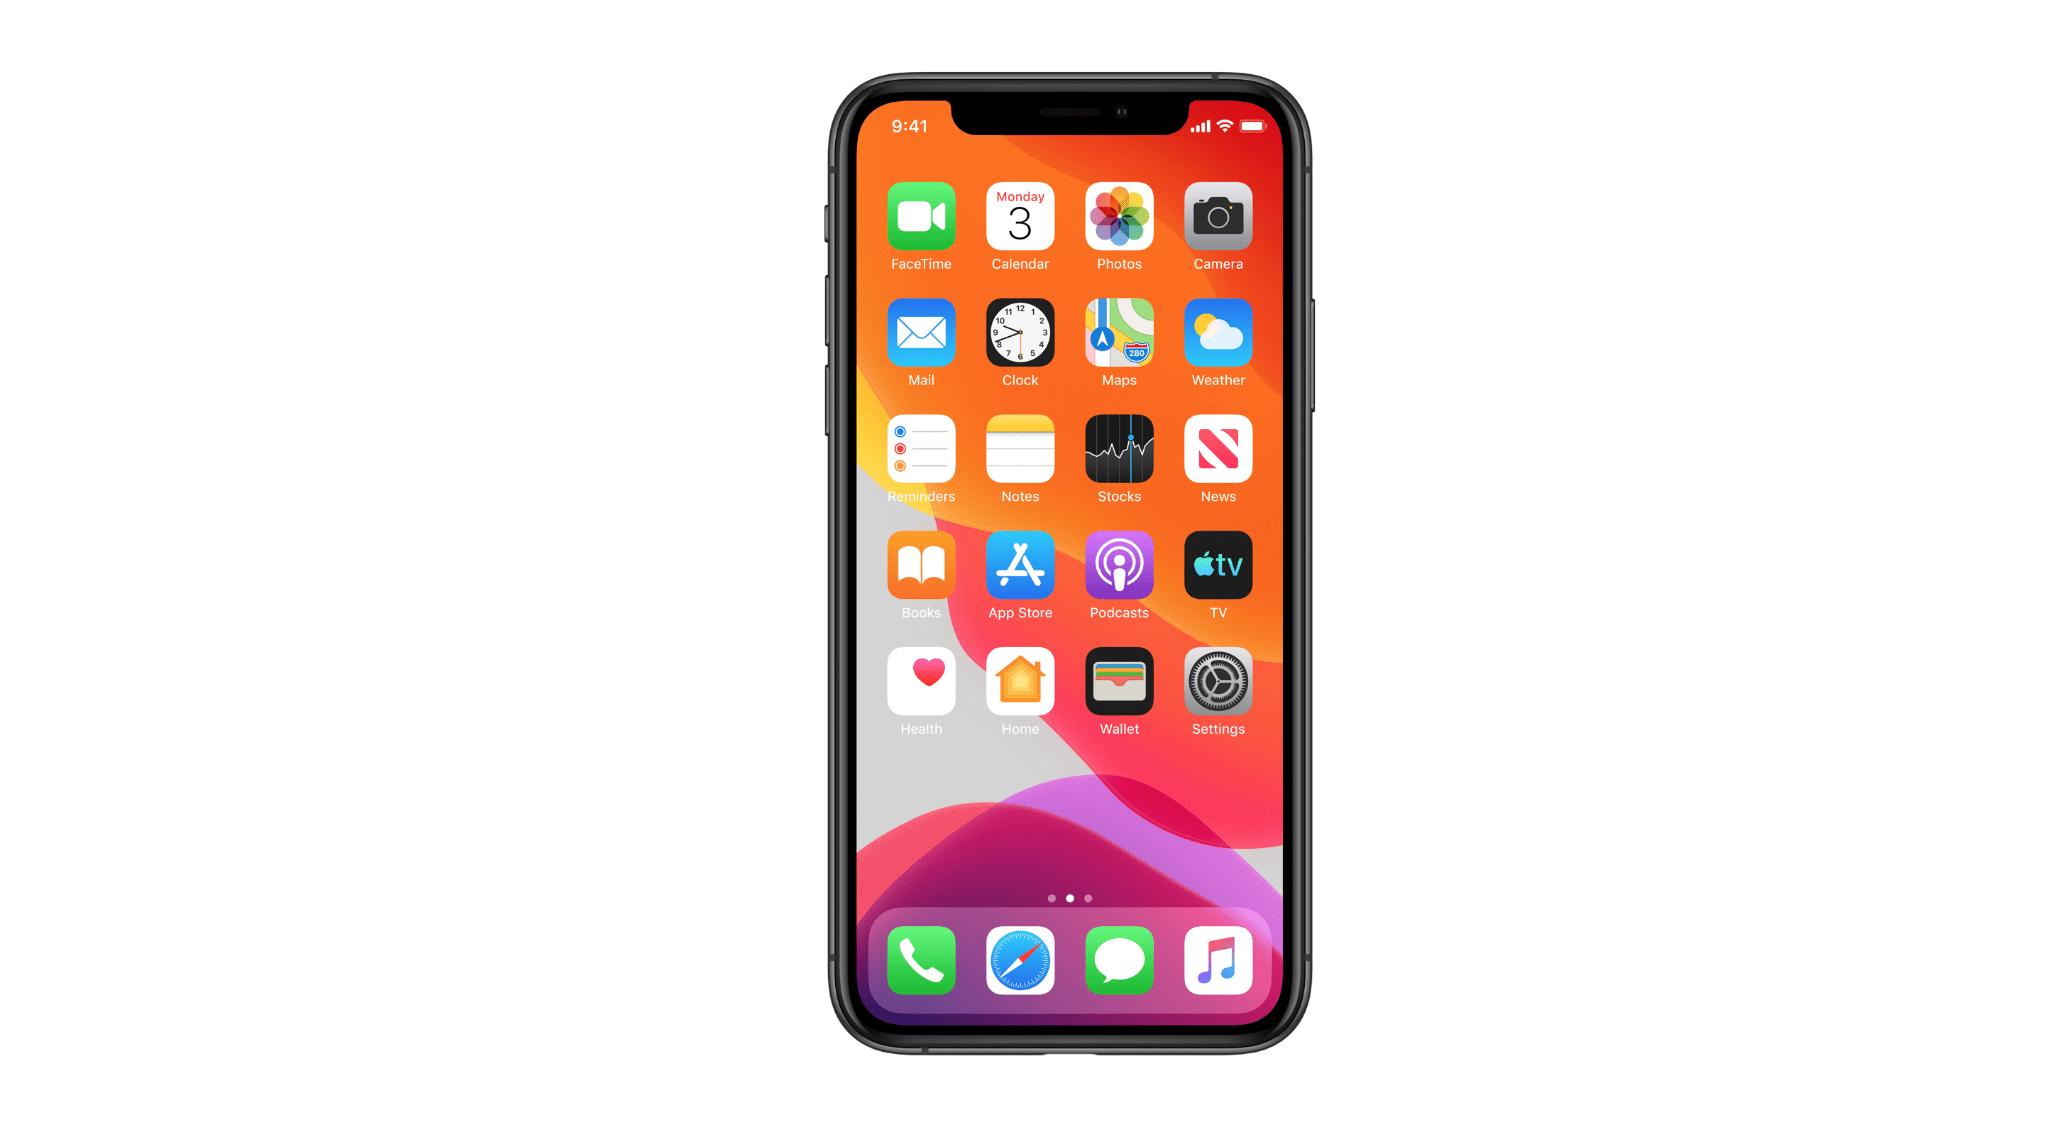 iOS 13 Beta on iPhone